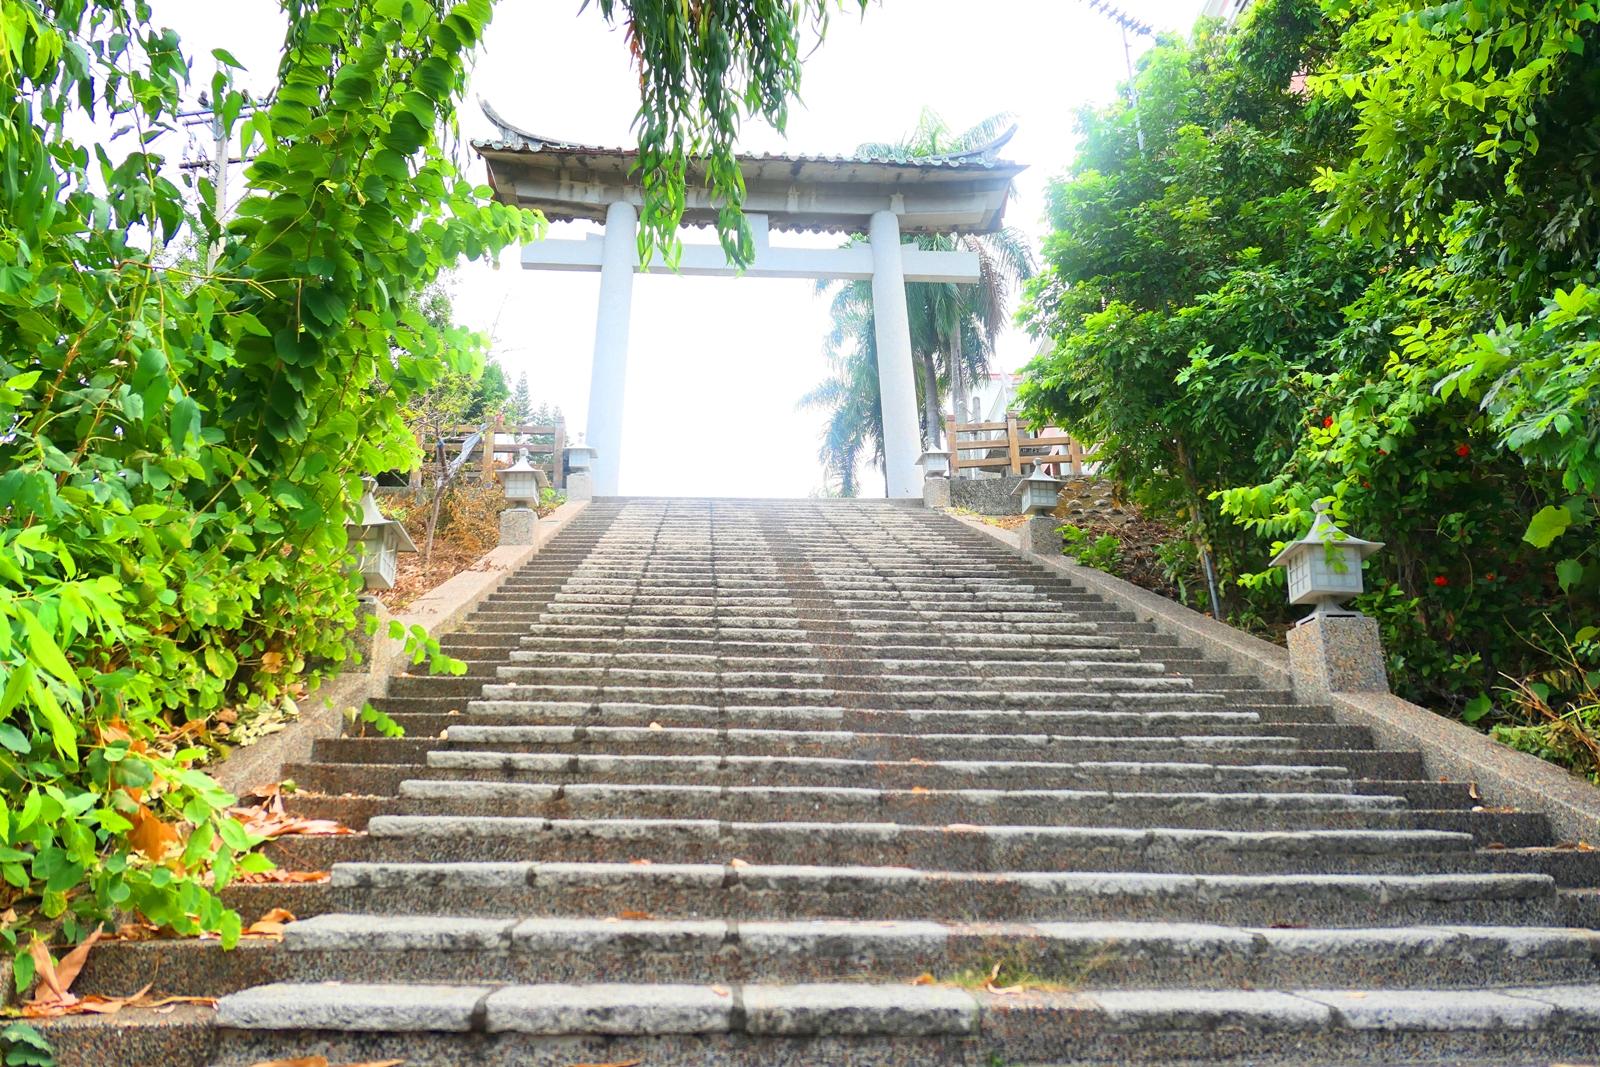 林內神社第二鳥居 | 天梯 | Linnei Shrine | Linnei | Yunlin | Taiwan | RoundtripJp